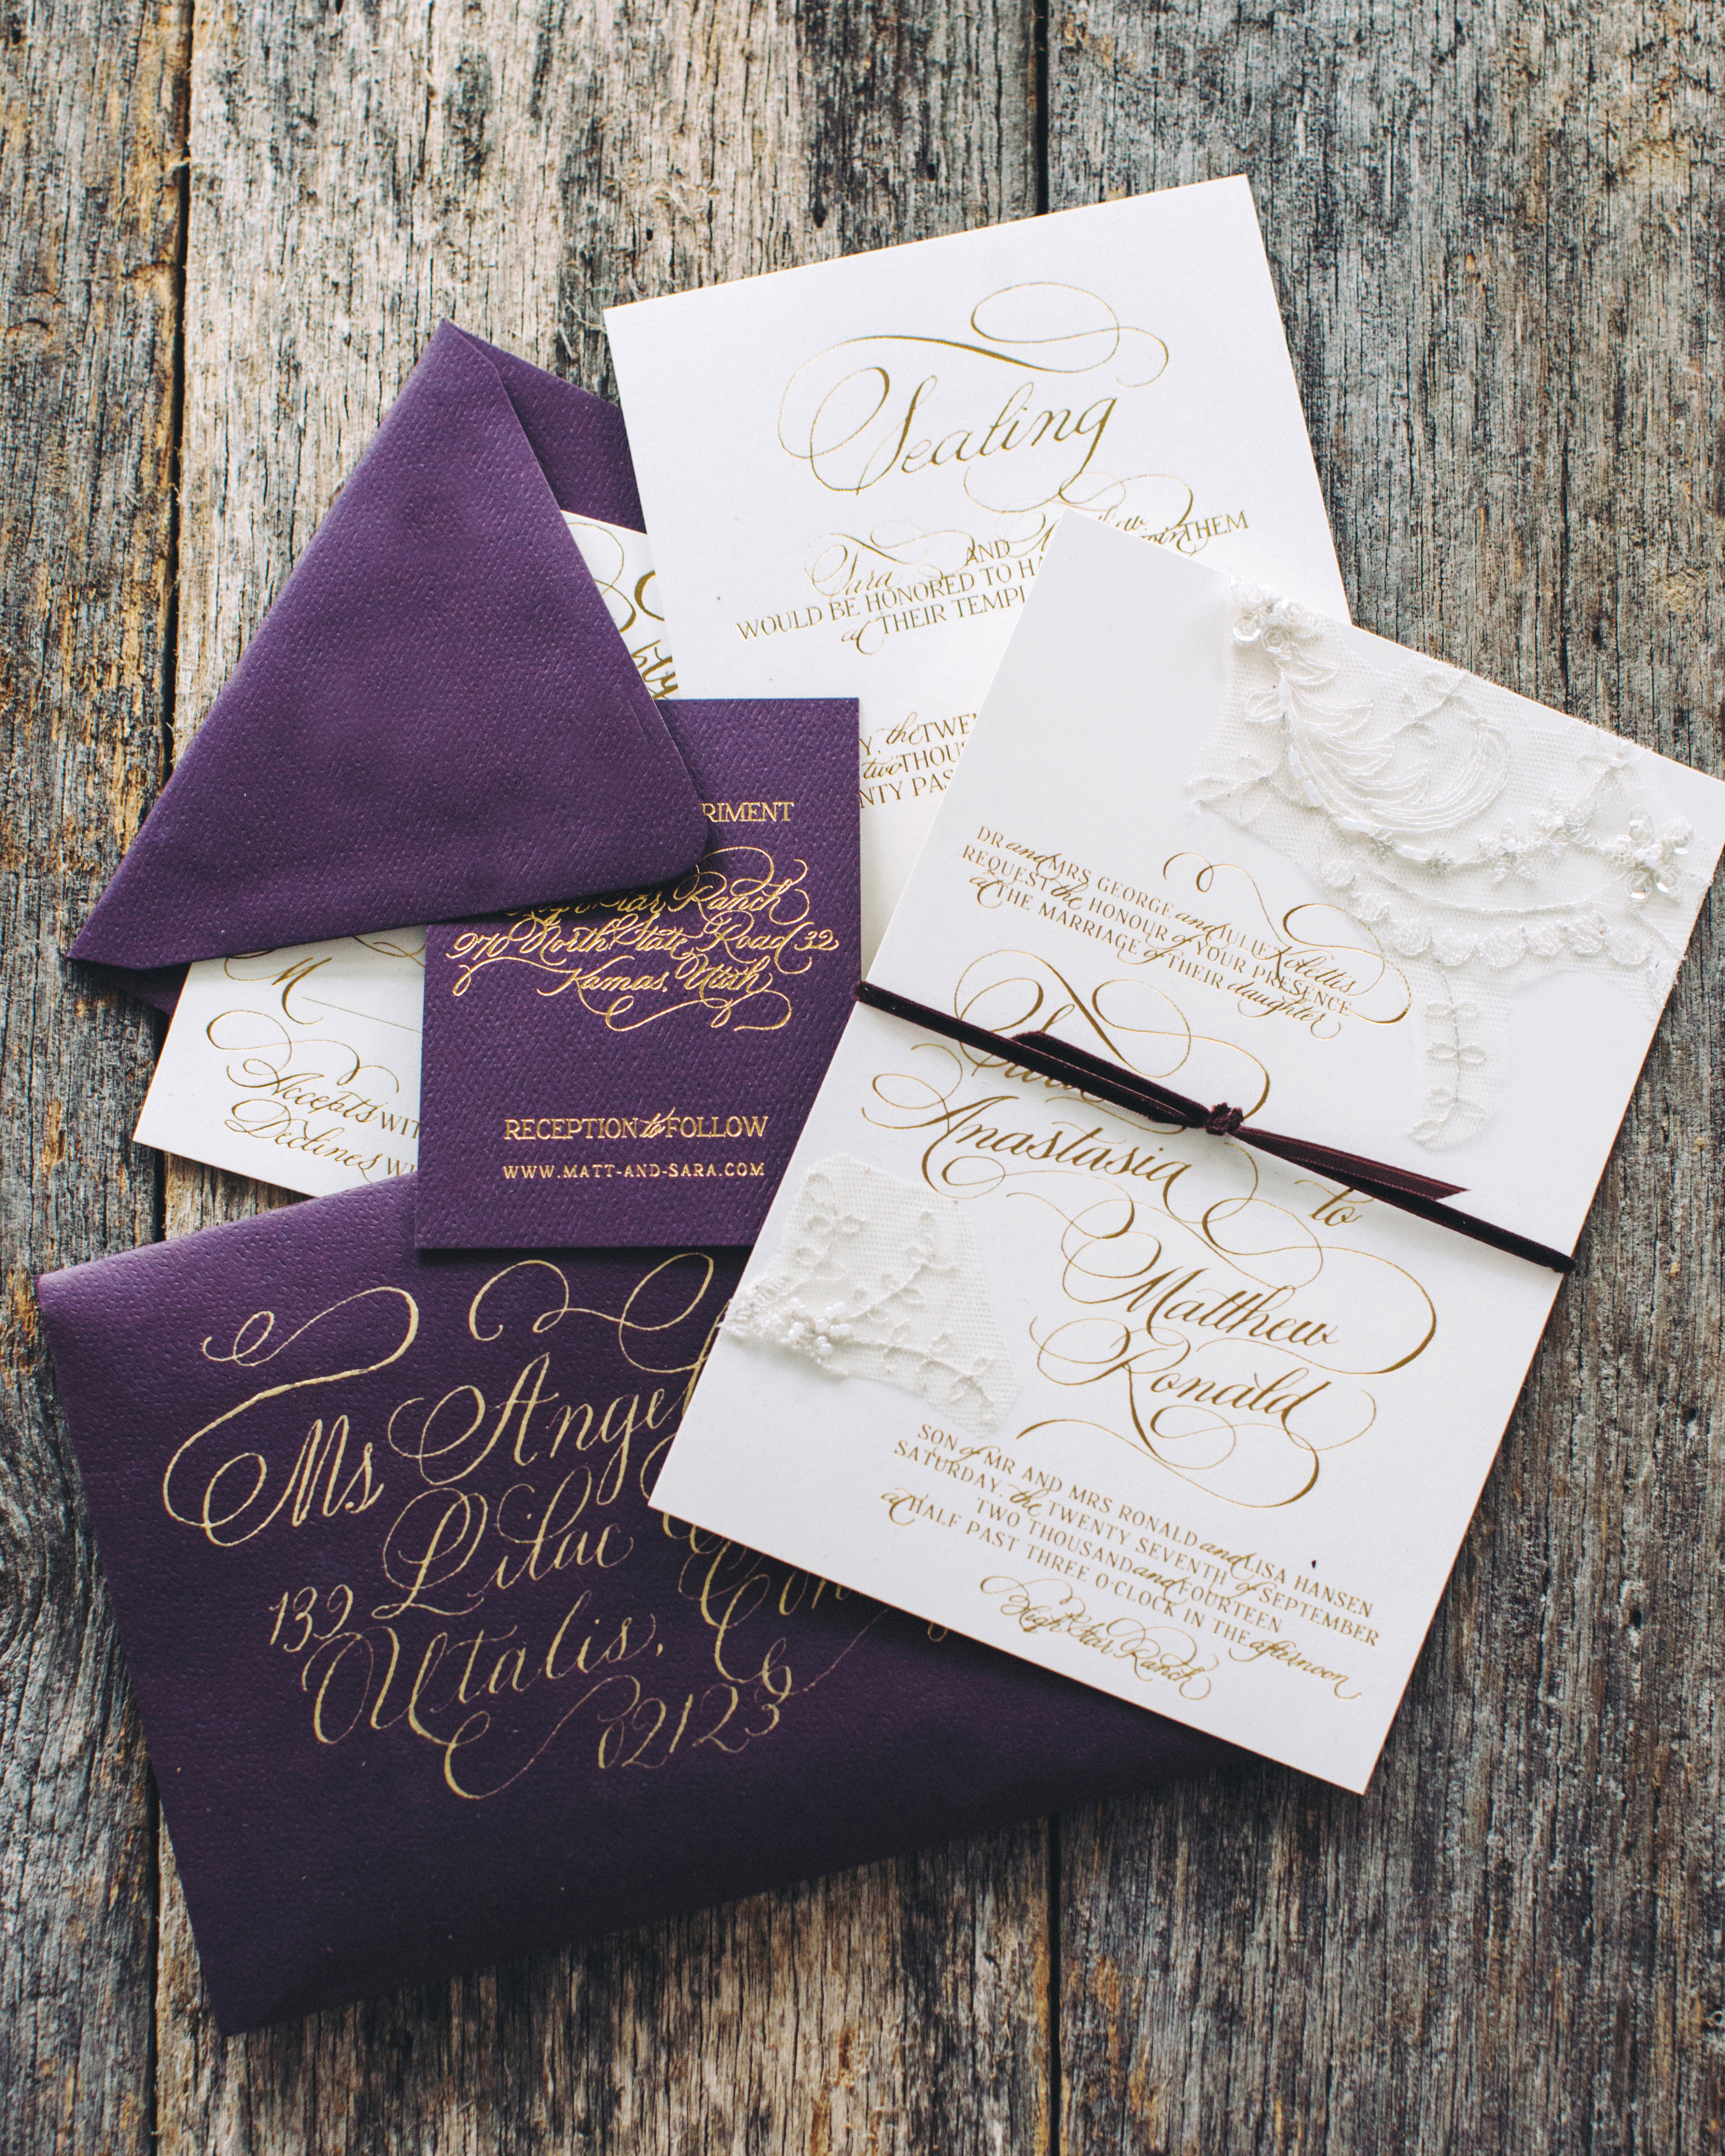 sara-matt-wedding-stationery-0098-s111990-0715.jpg